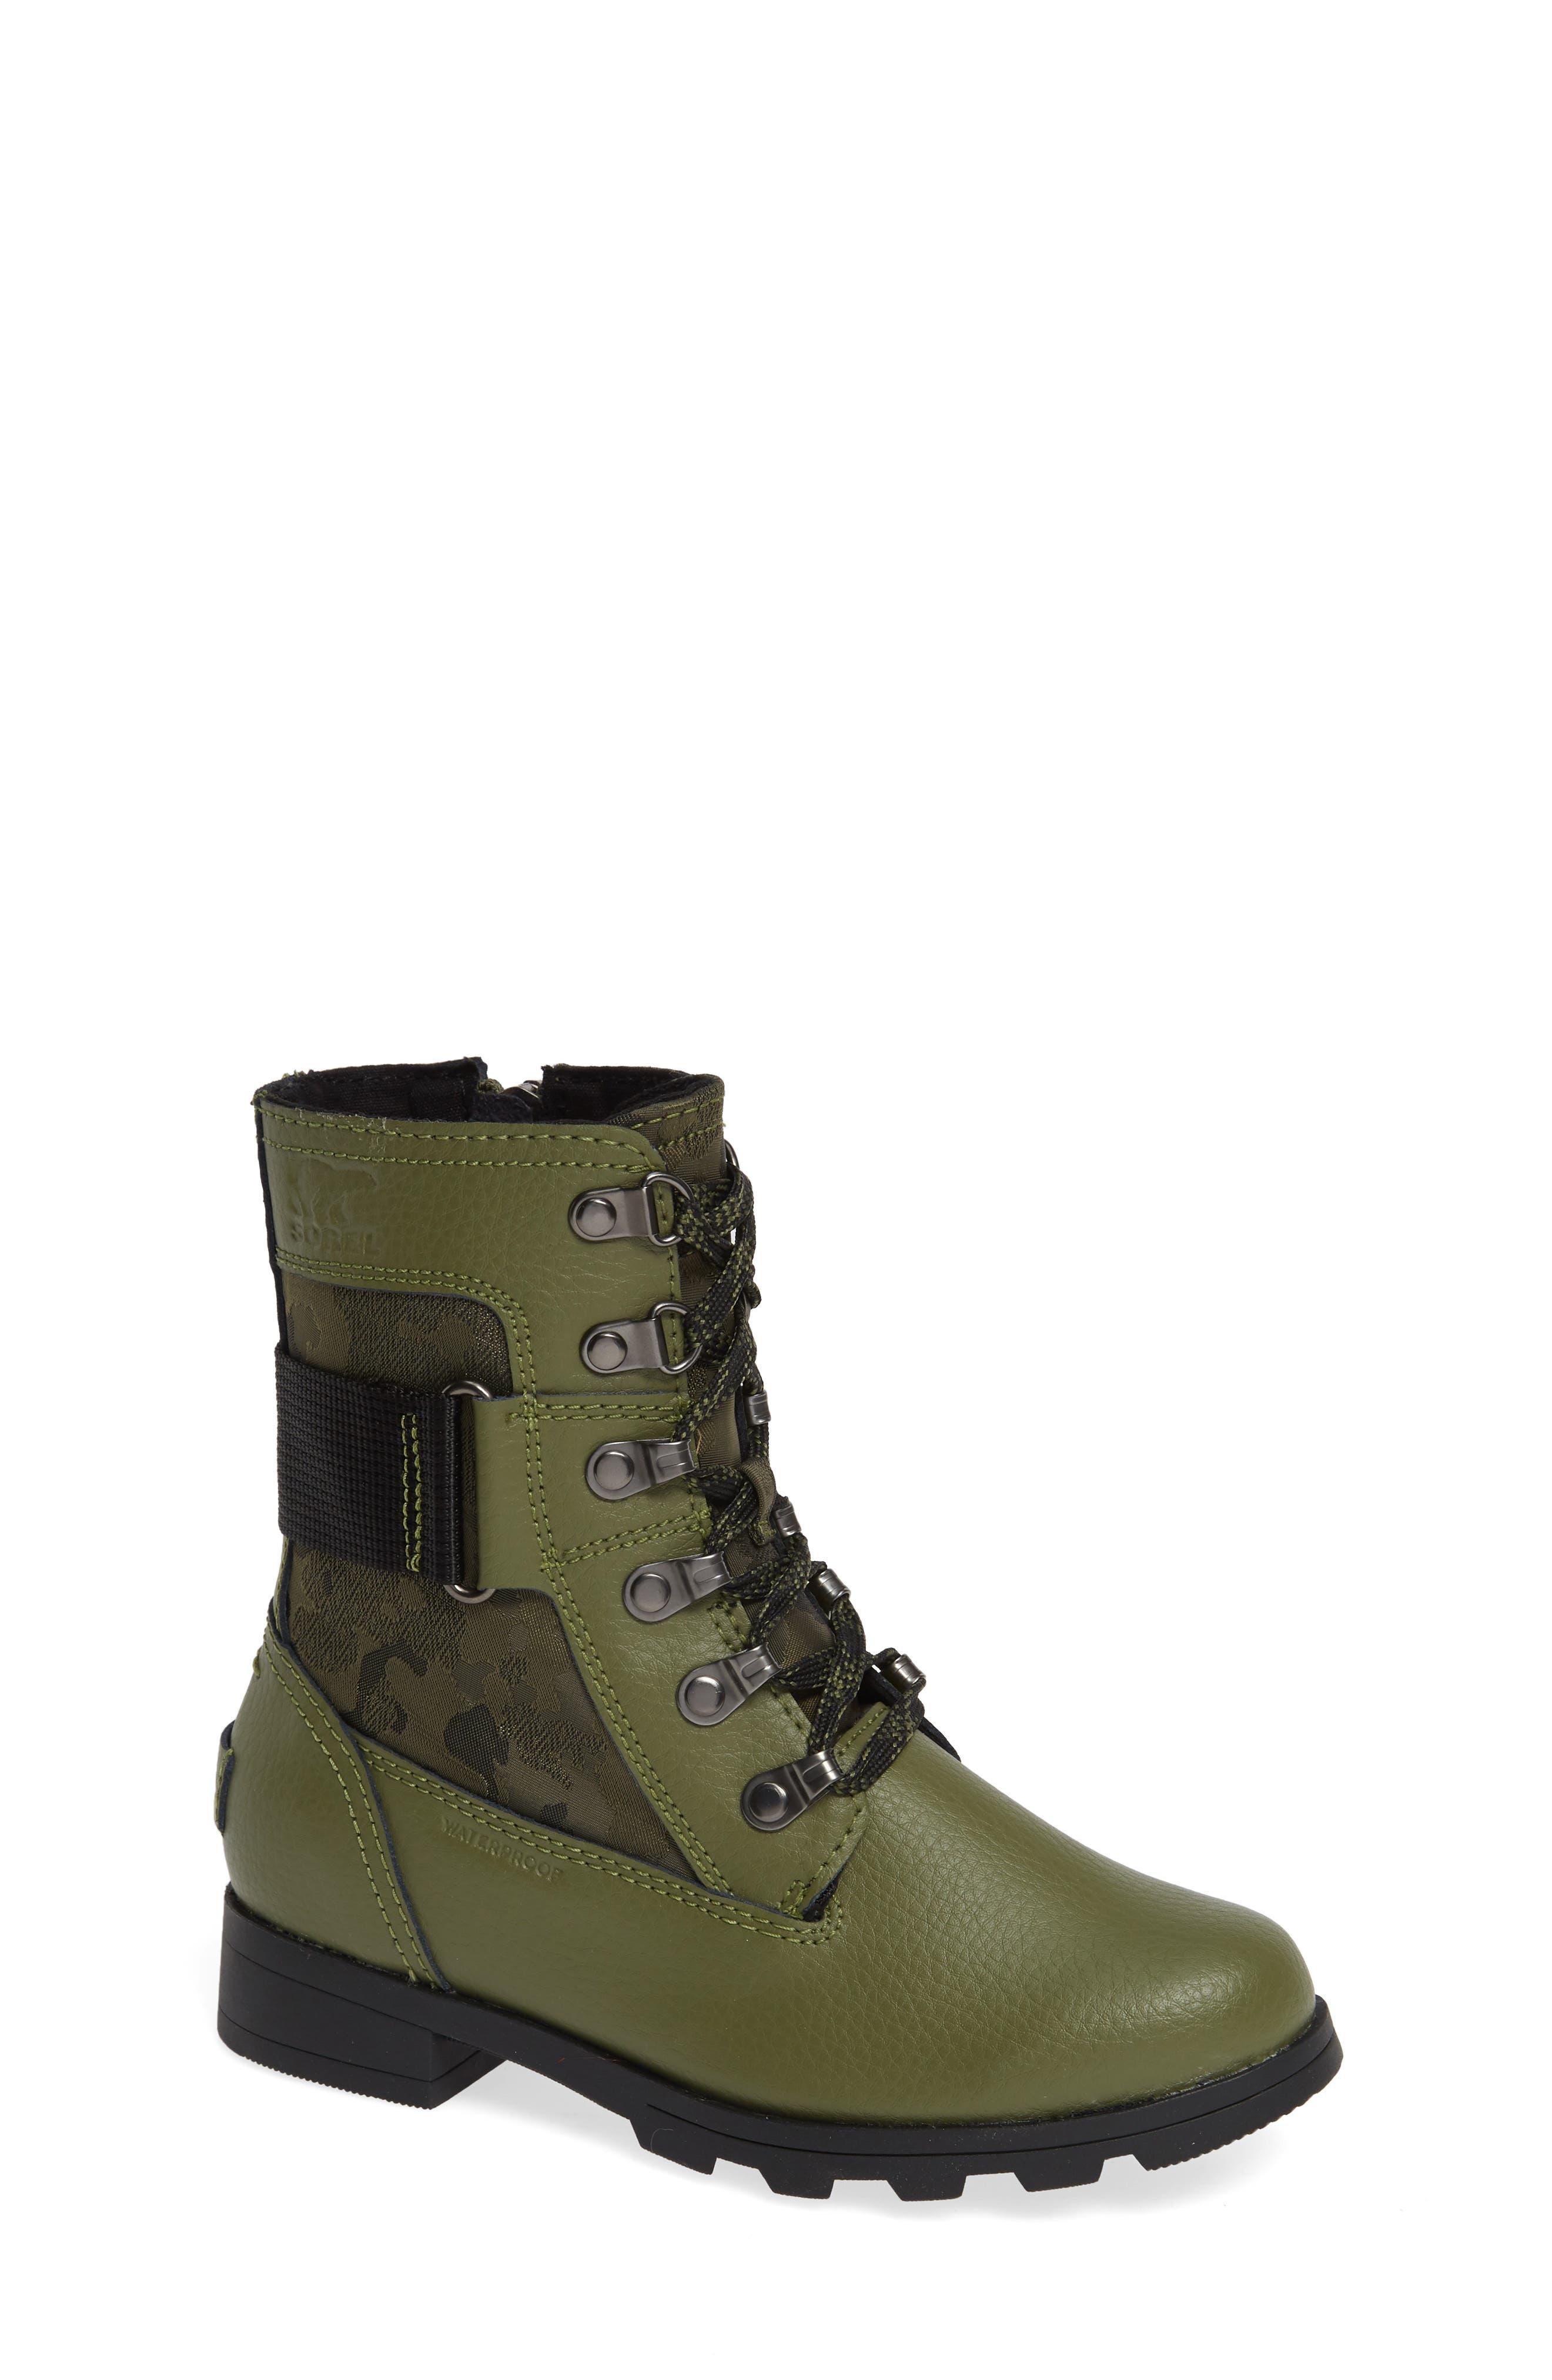 Emelie Waterproof Boot,                             Main thumbnail 1, color,                             HIKER GREEN/ BLACK